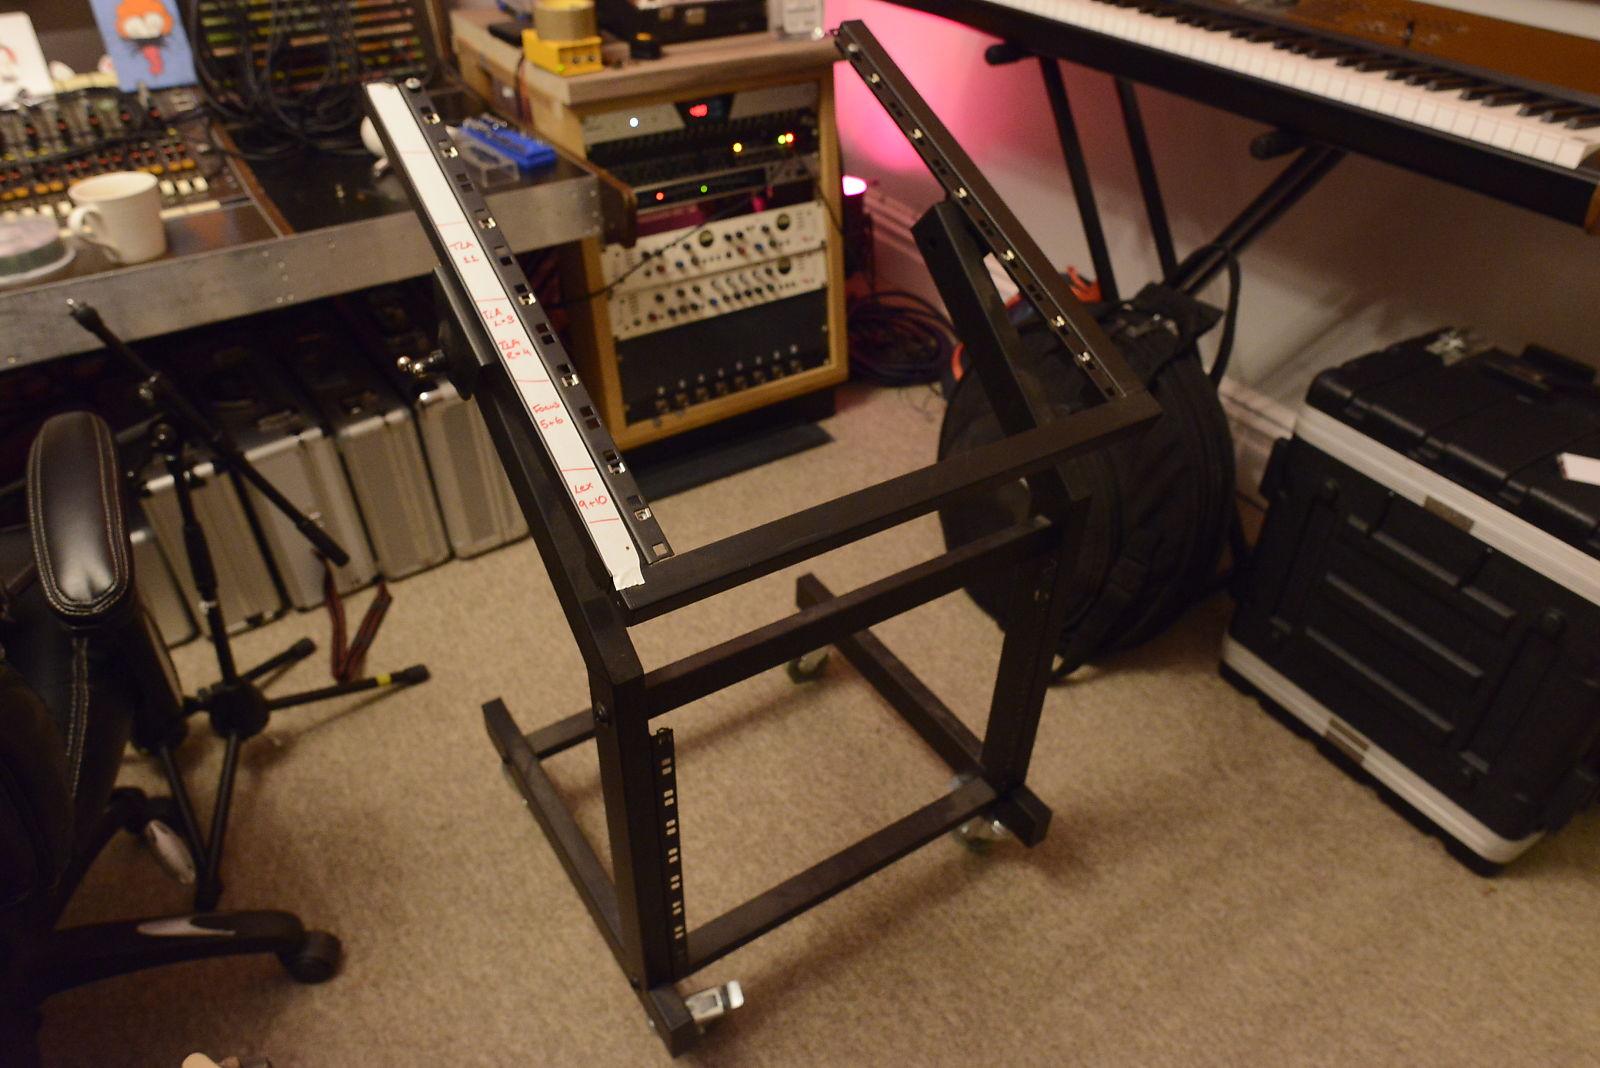 19U Outboard Gear Adjustable Studio Mixing Rack Trolley on Wheels